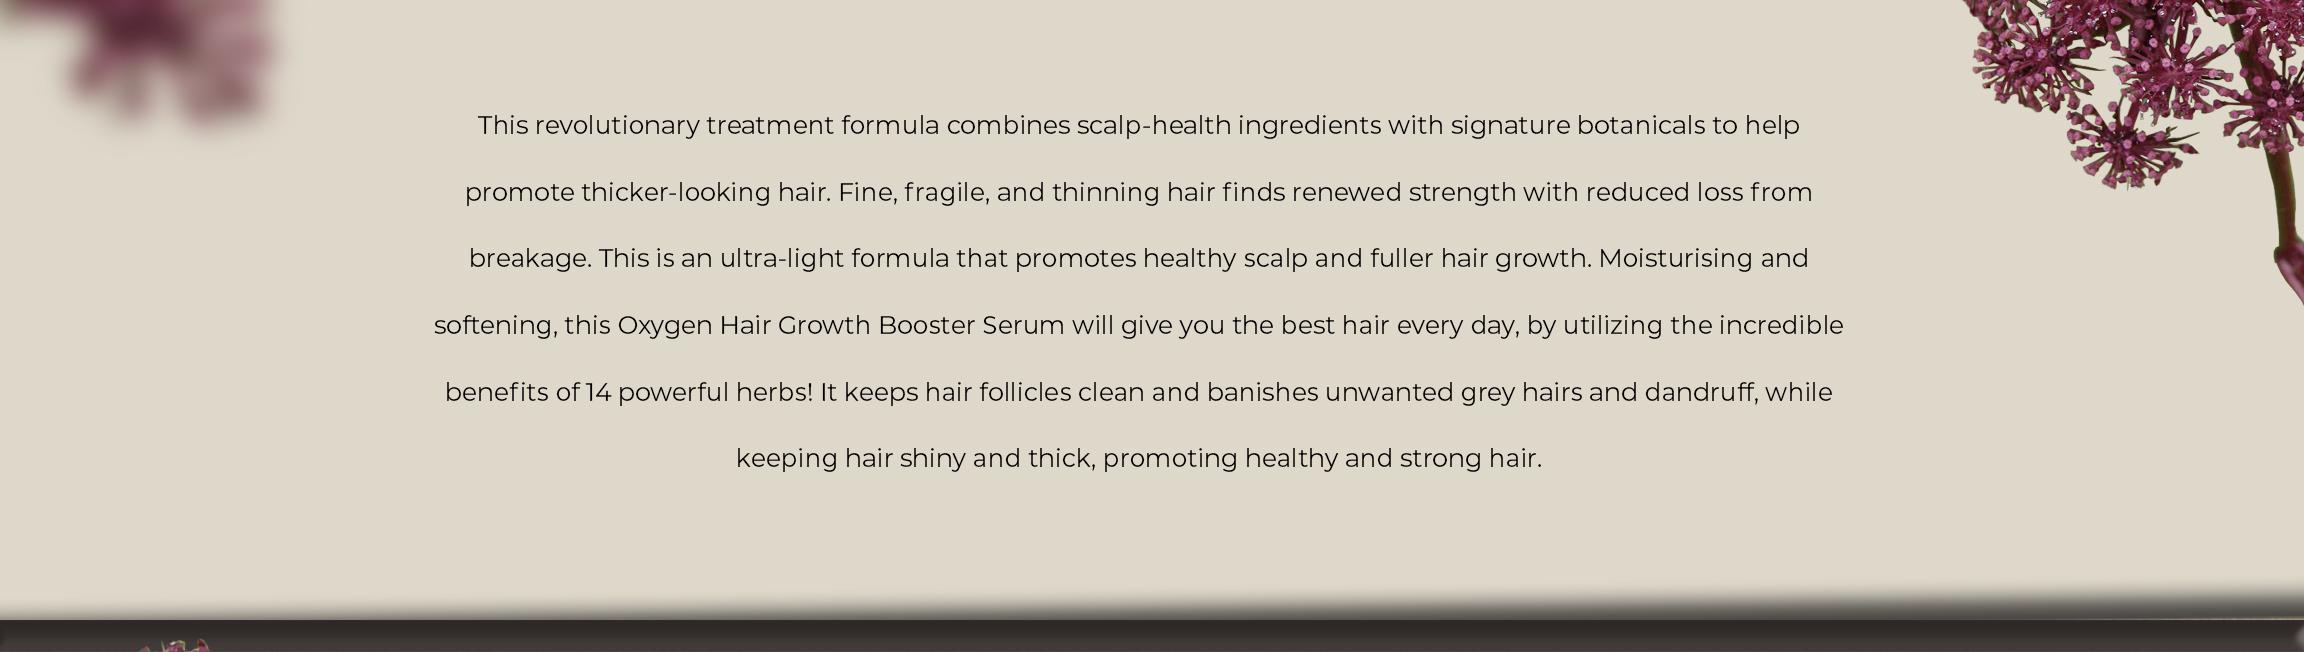 hair-serum-desc